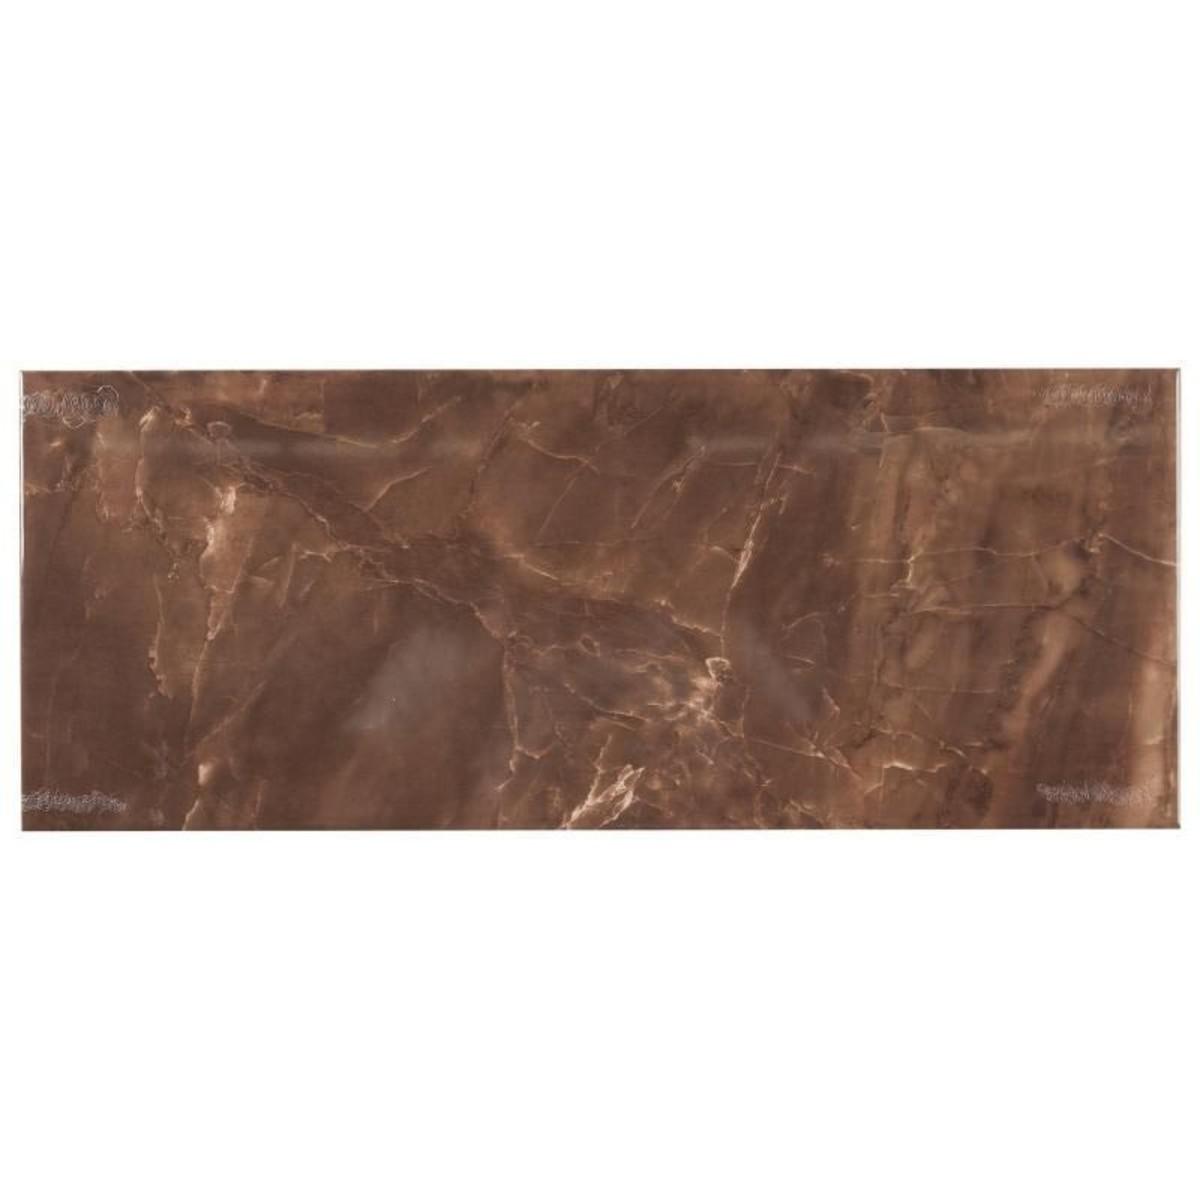 Плитка настенная Анталия 3Т 50х20 см 13 м2